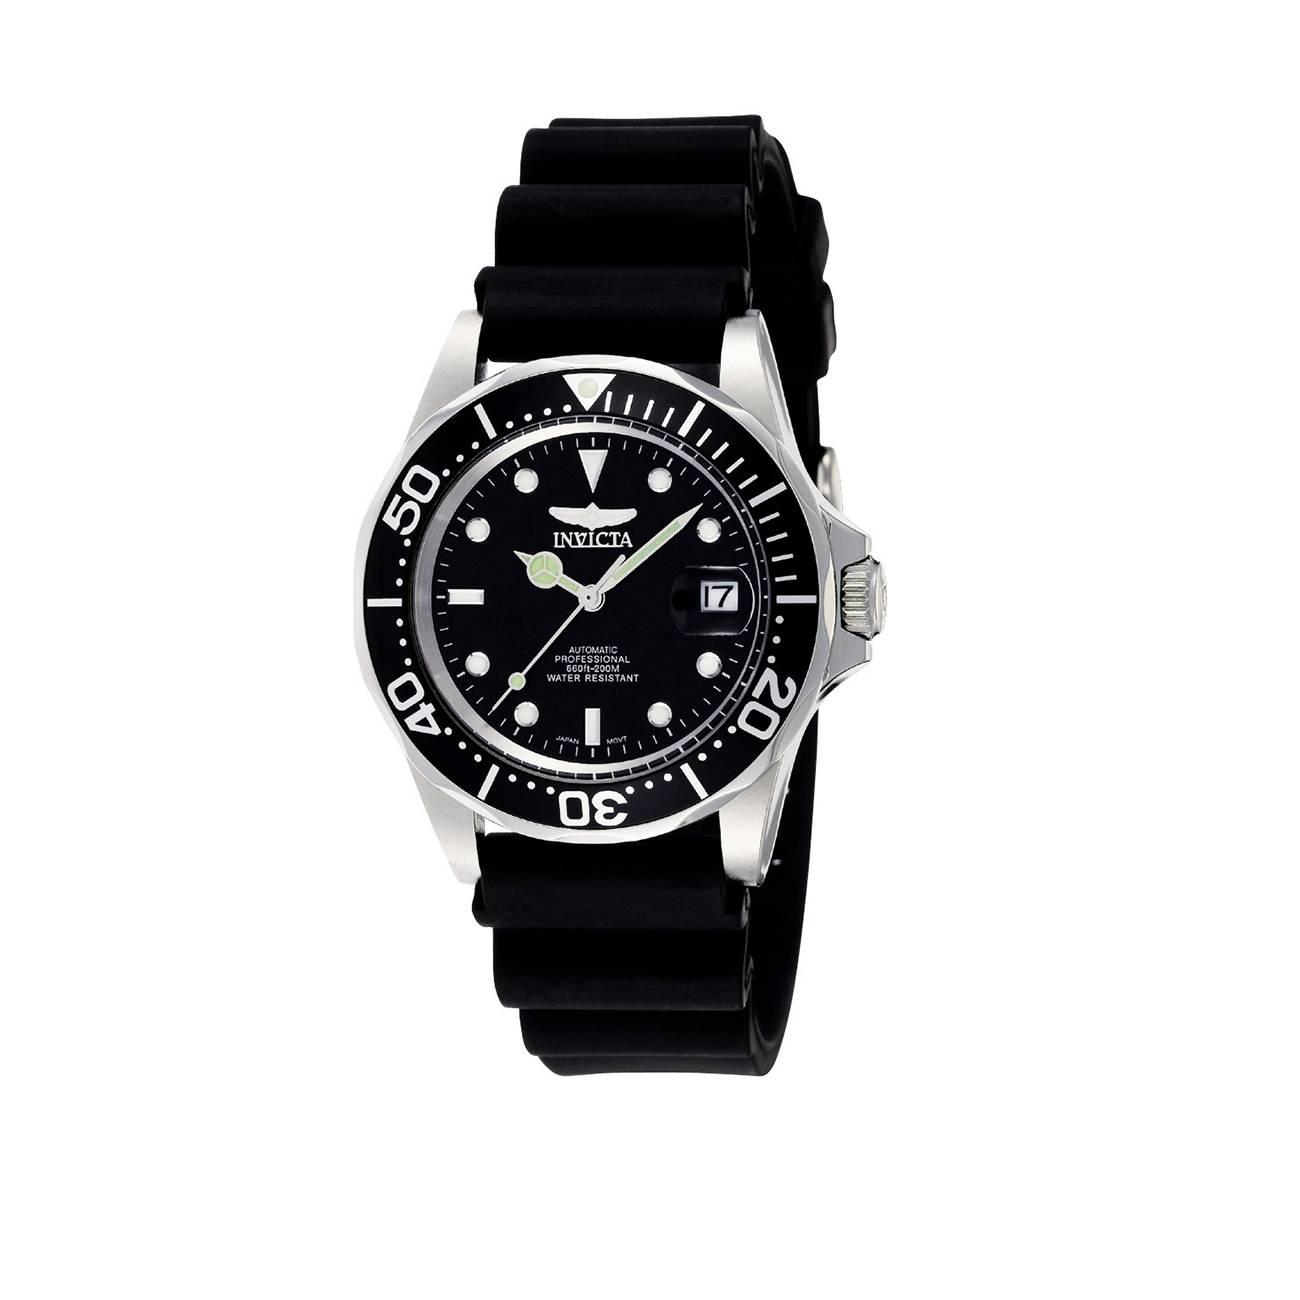 Pro Diver 9110 imagine